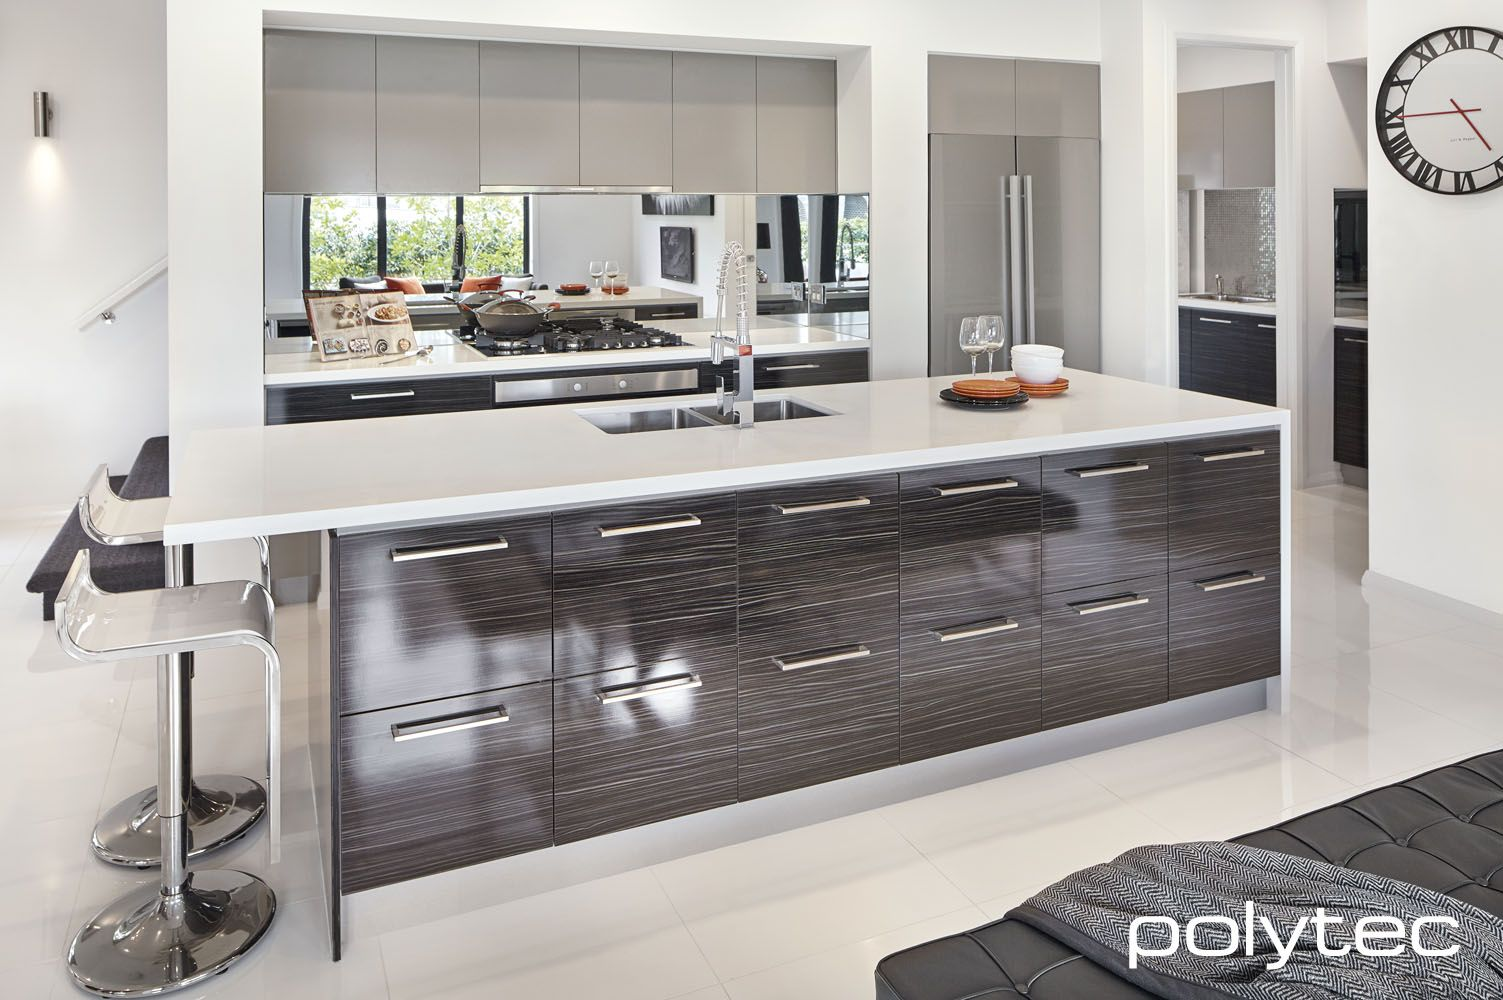 Polytec Modern Kitchen Design Kitchen Cabinets Painted Grey Trendy Kitchen Backsplash